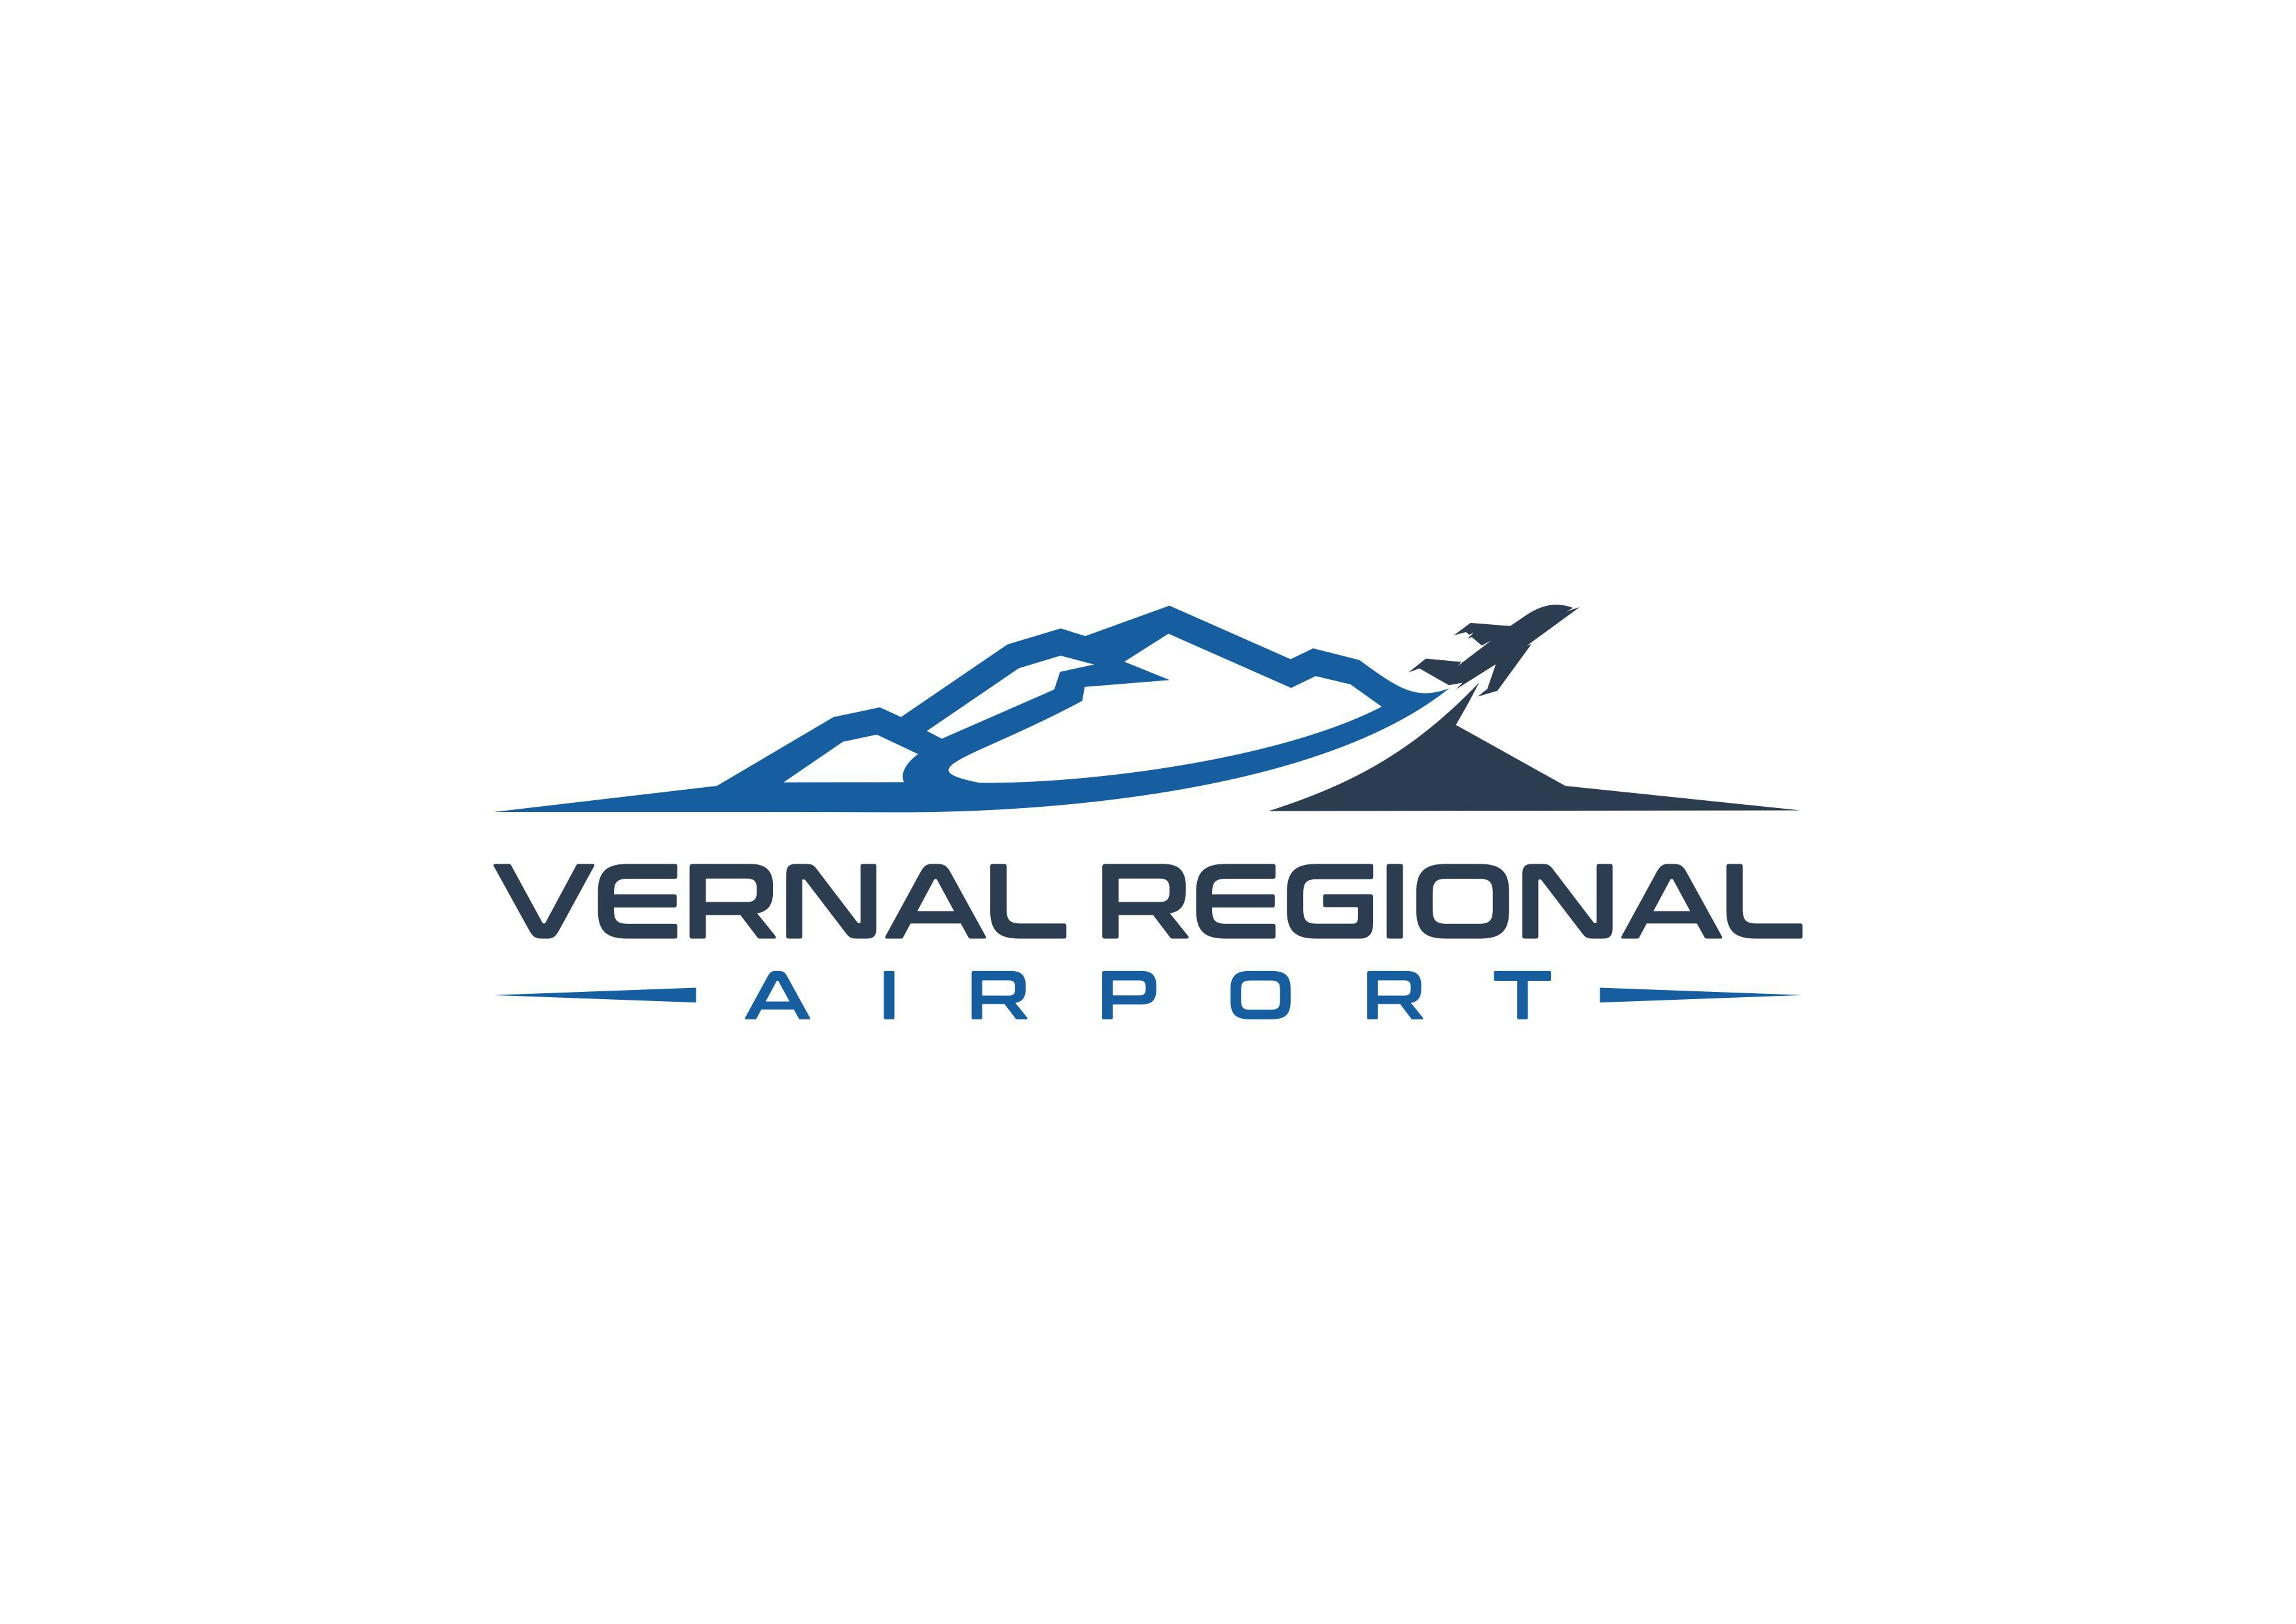 Vernal Regional Airport looking for clean, sleek and professional logo